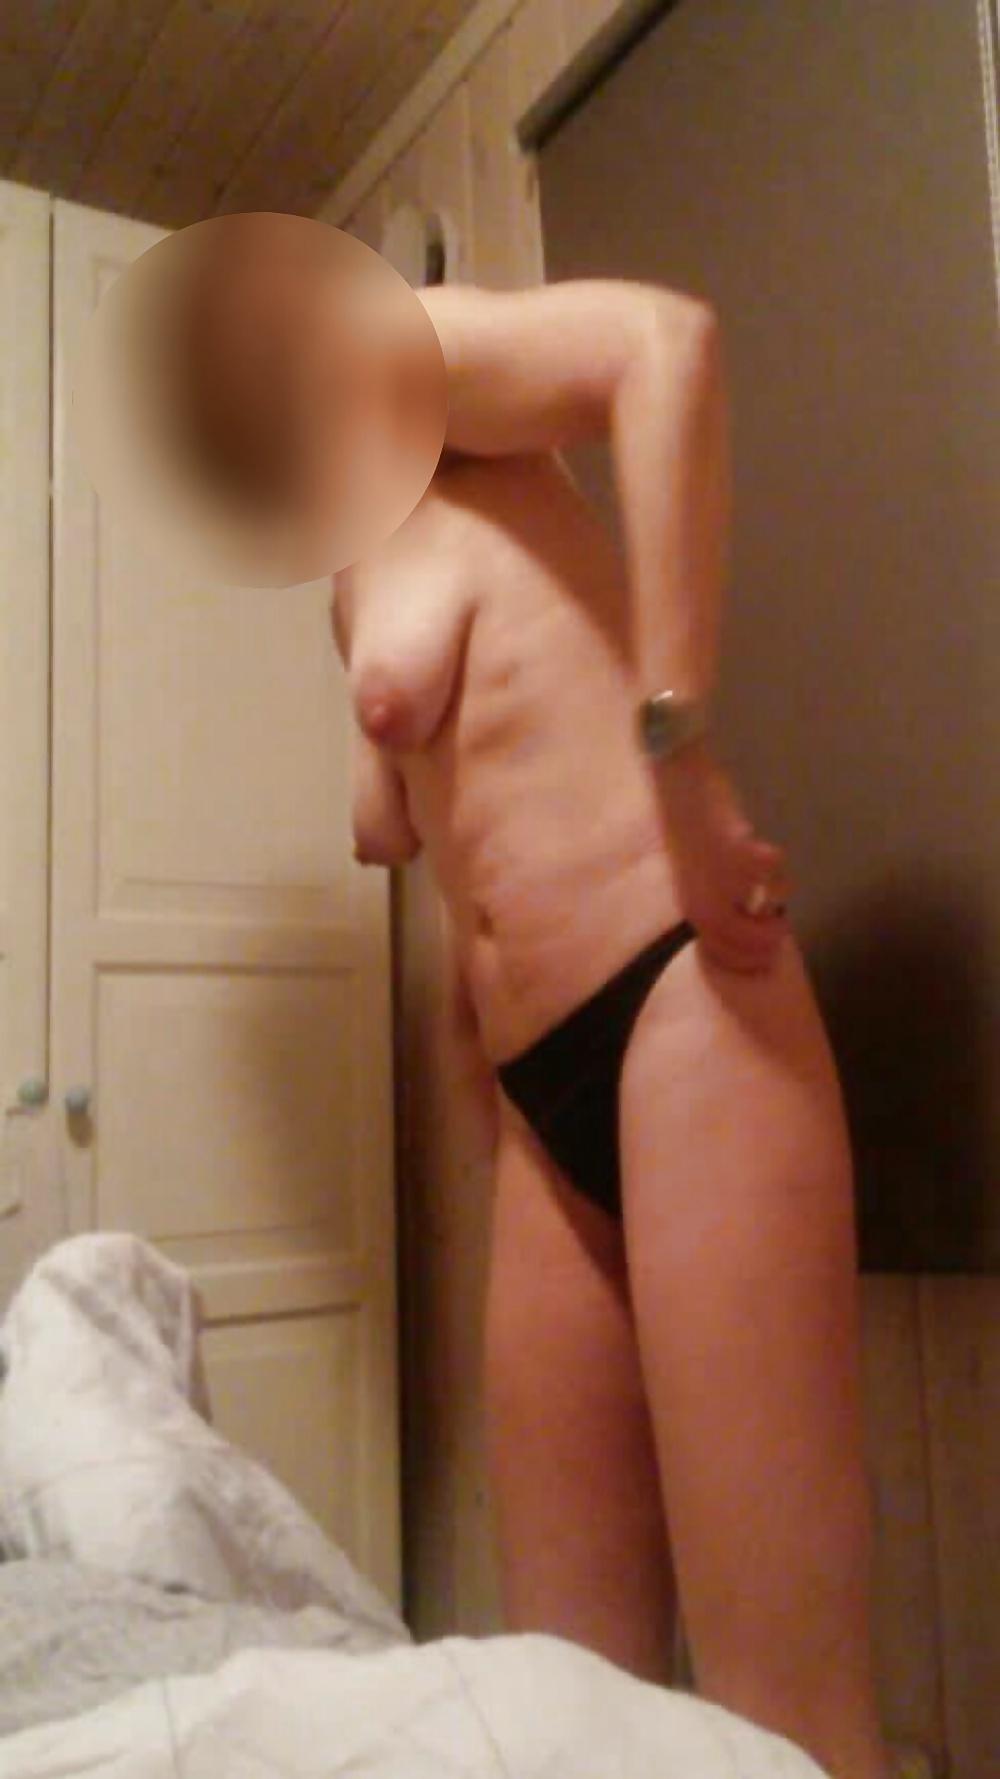 Girls undressing for camera-1997